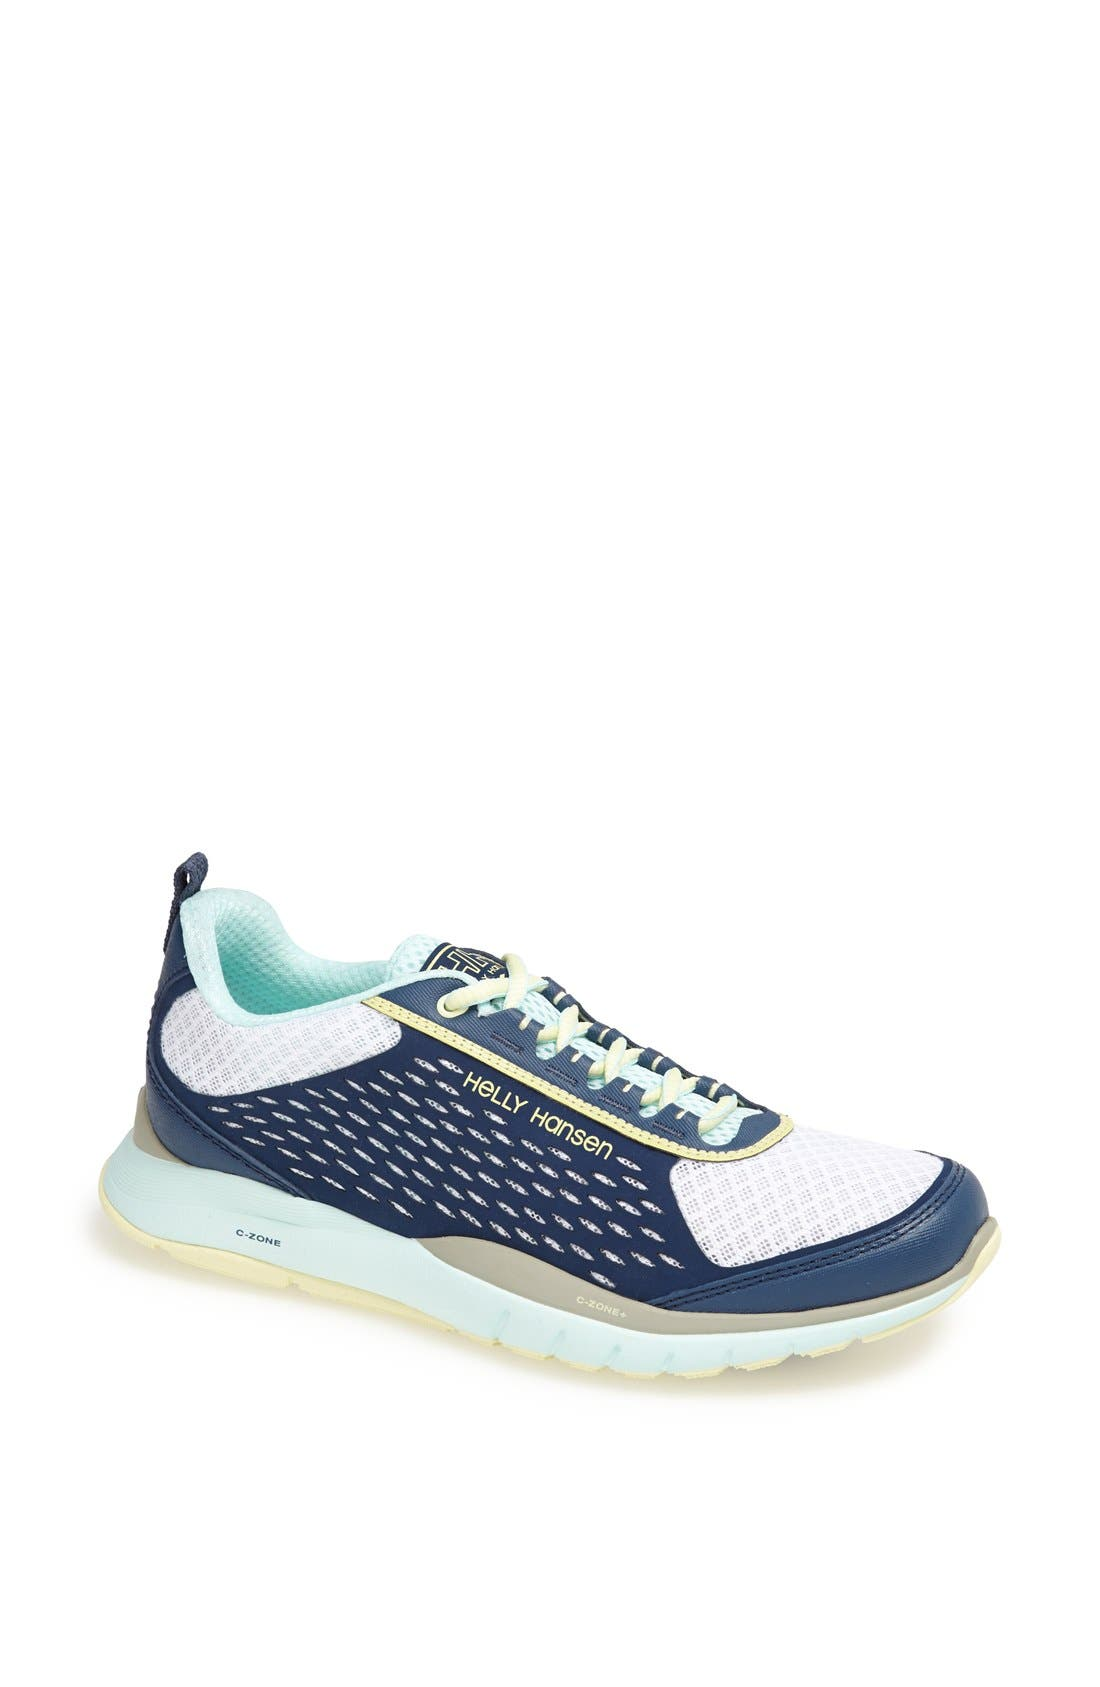 Main Image - Helly Hansen 'Panarena' Running Shoe (Women)